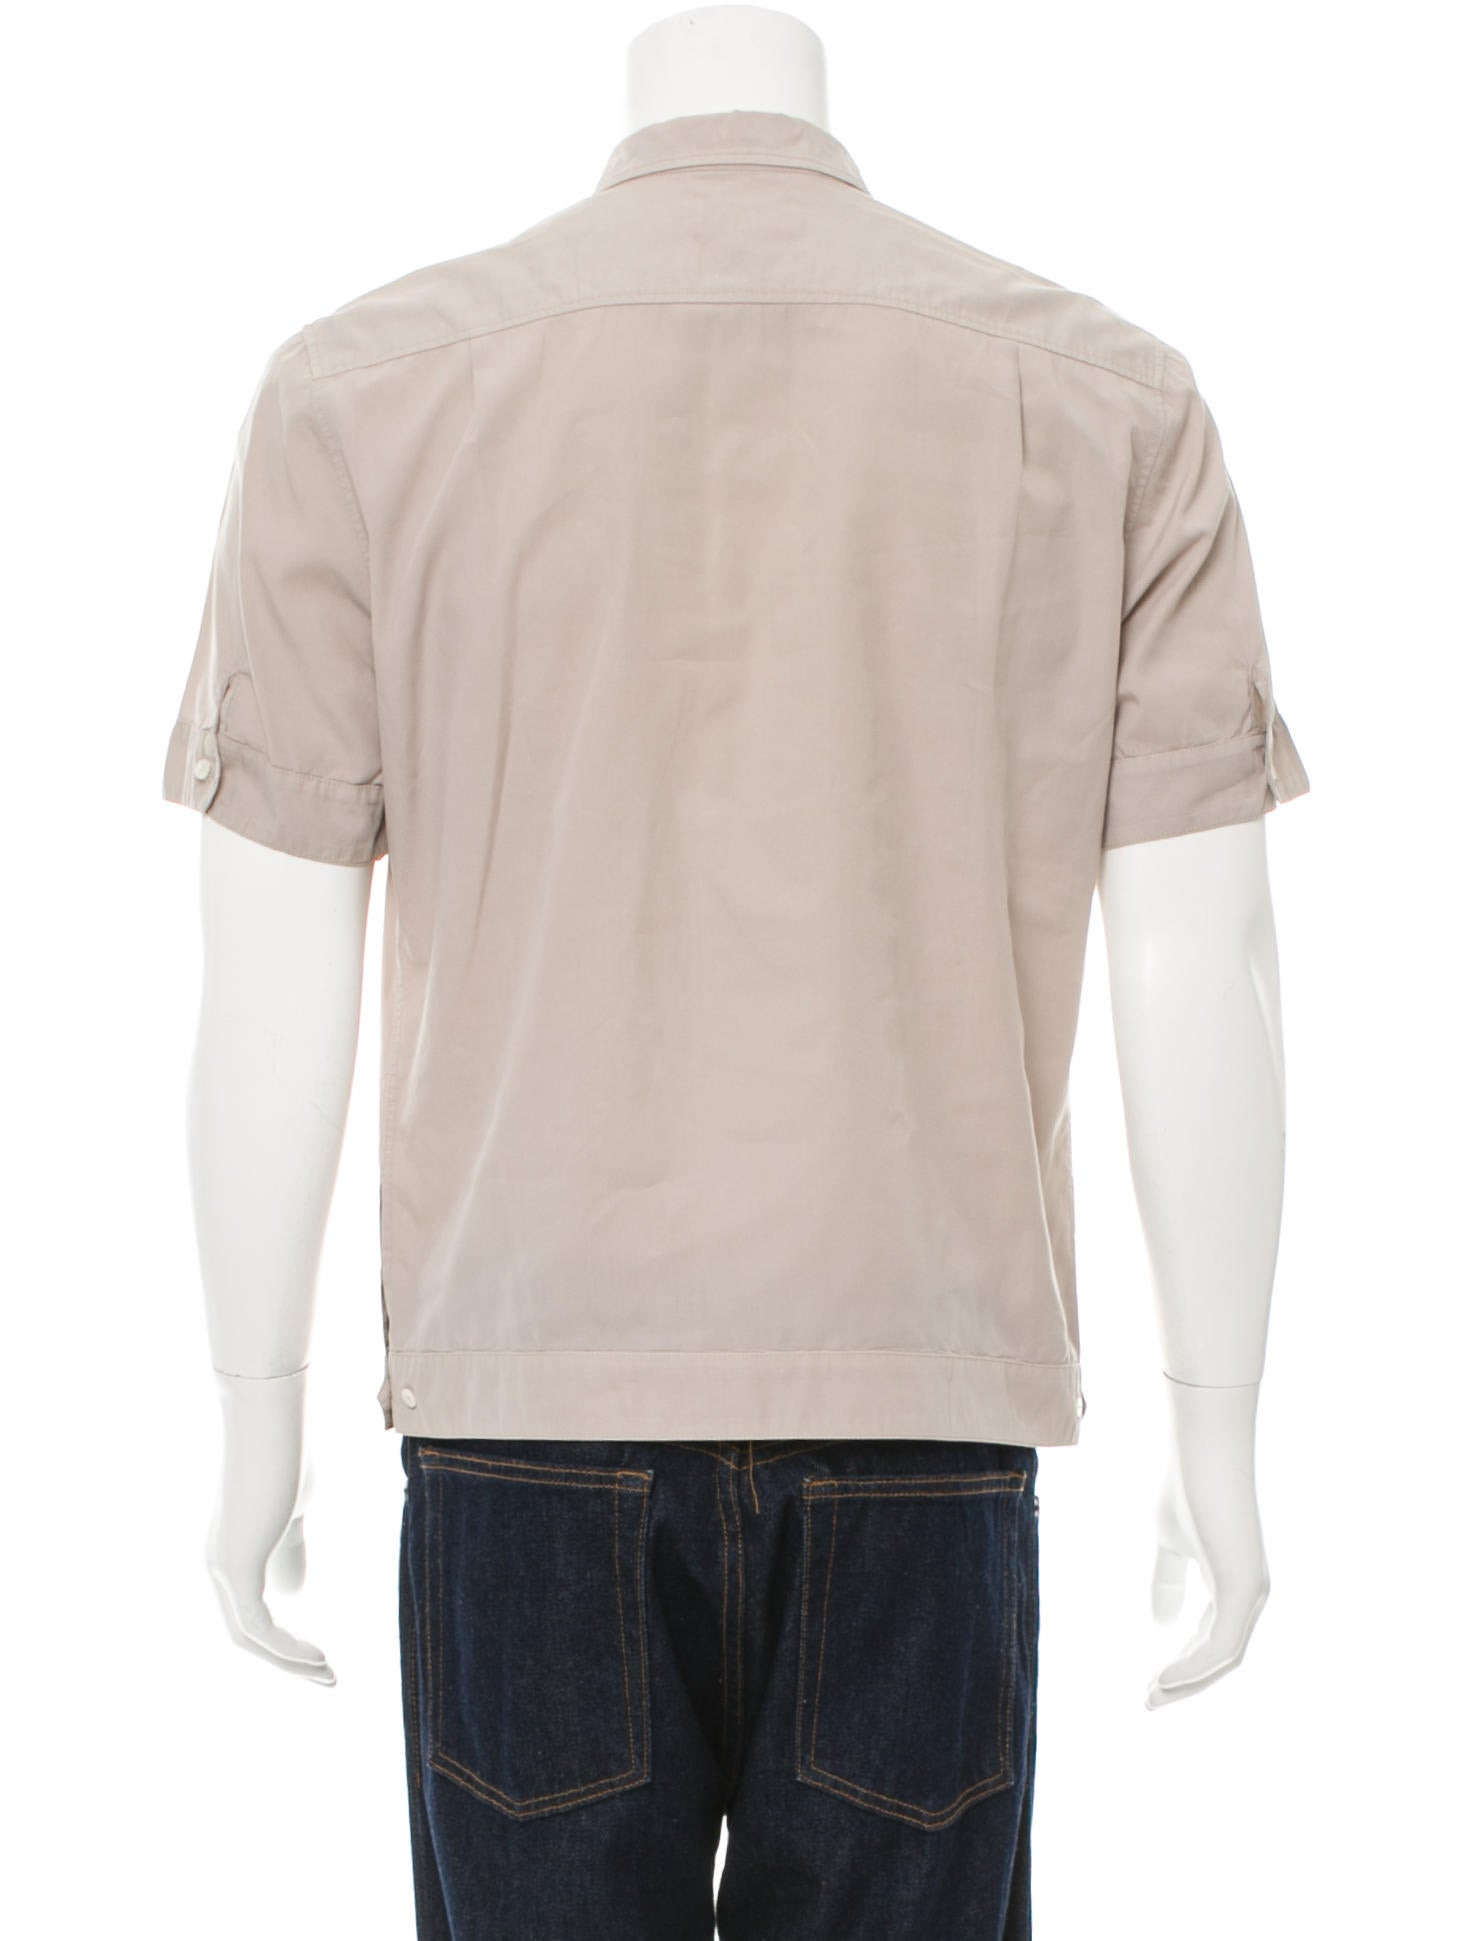 Dolce Gabbana Utility Button Up Shirt Clothing